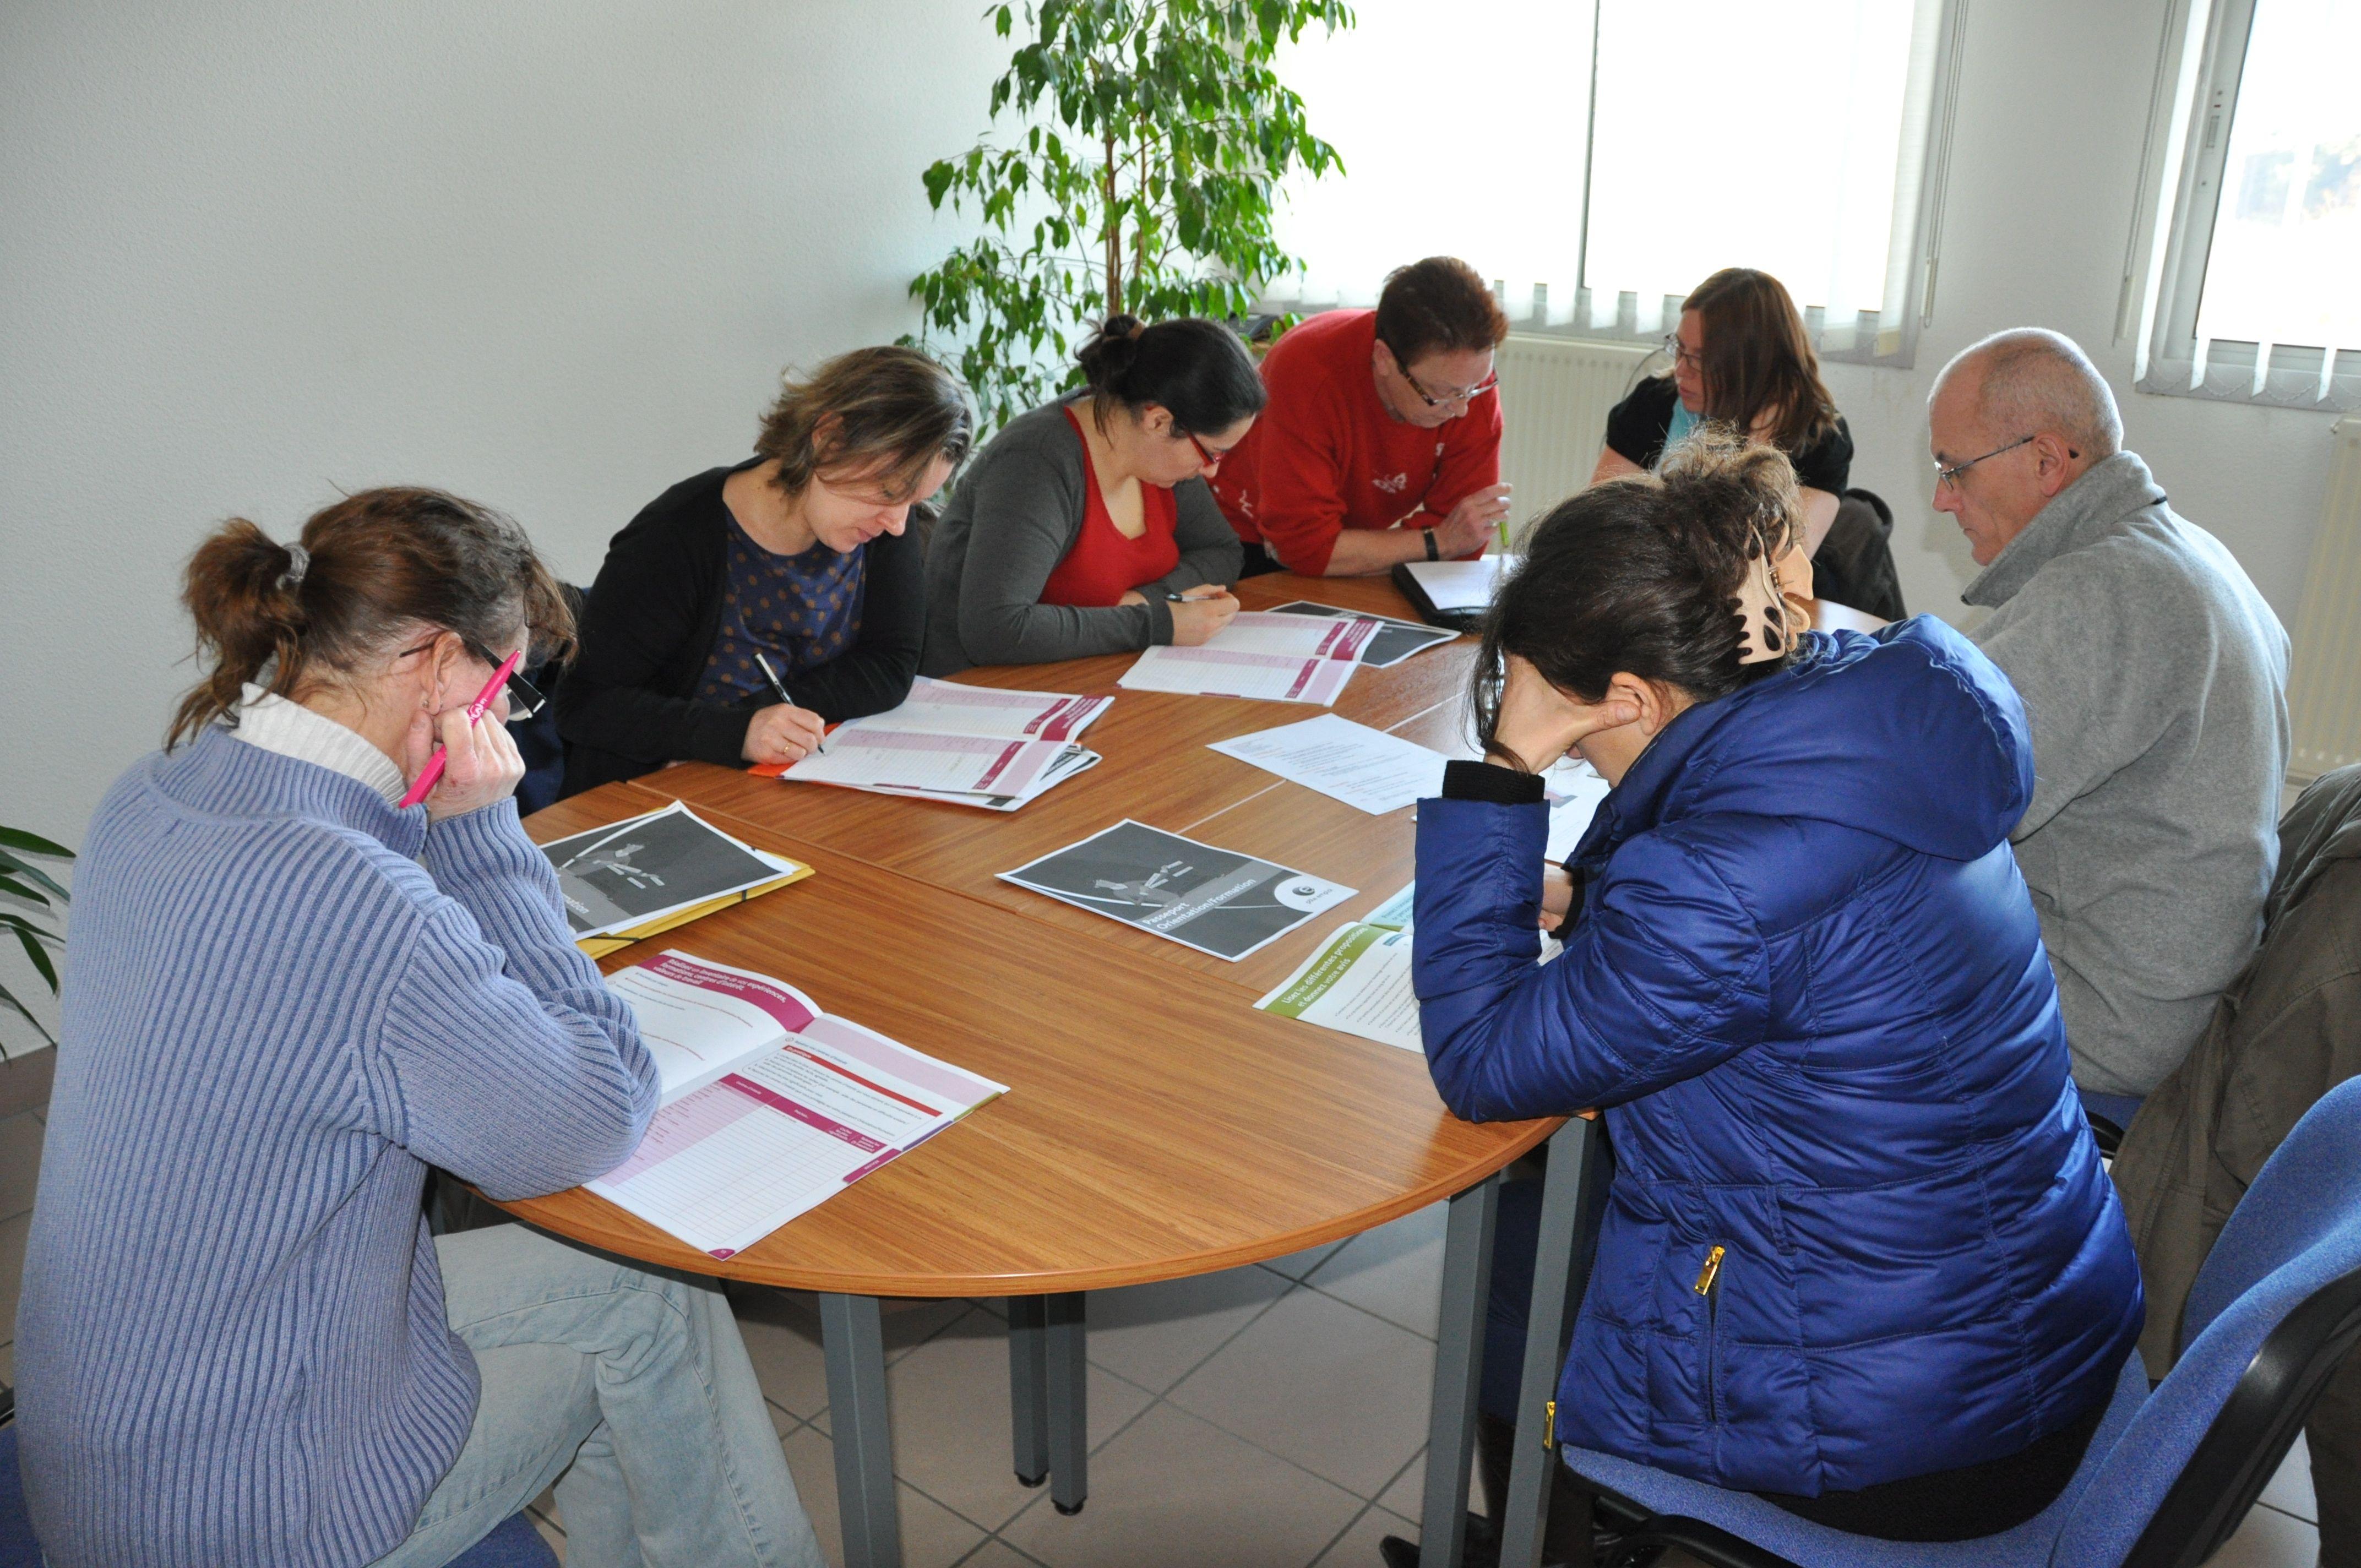 ateliers mutli-th u00e8mes